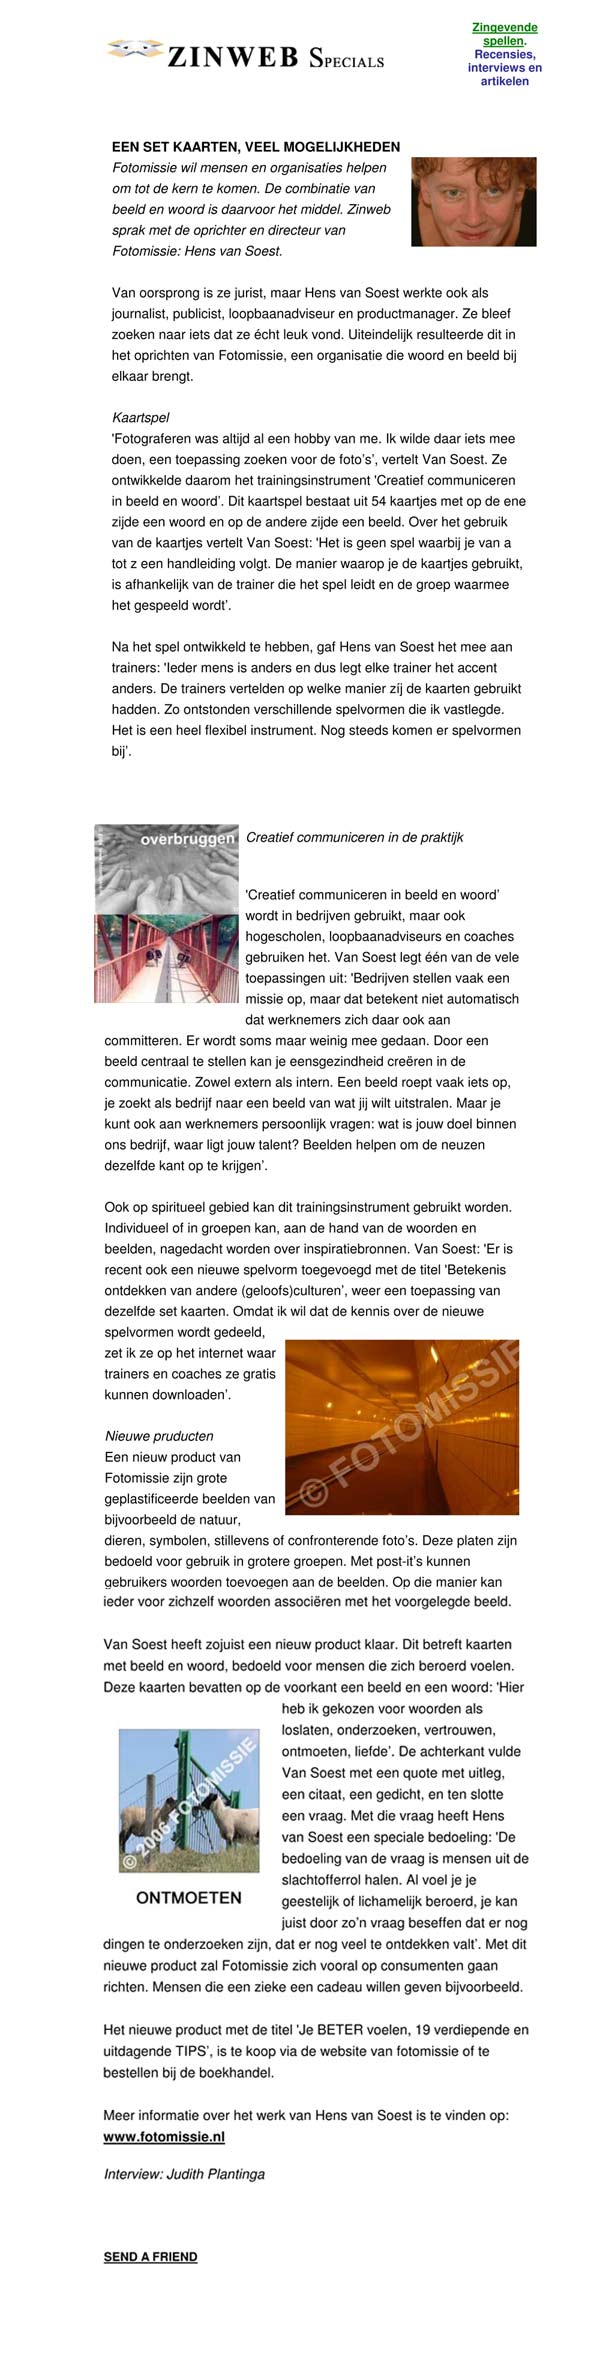 artikelcc-zinweb